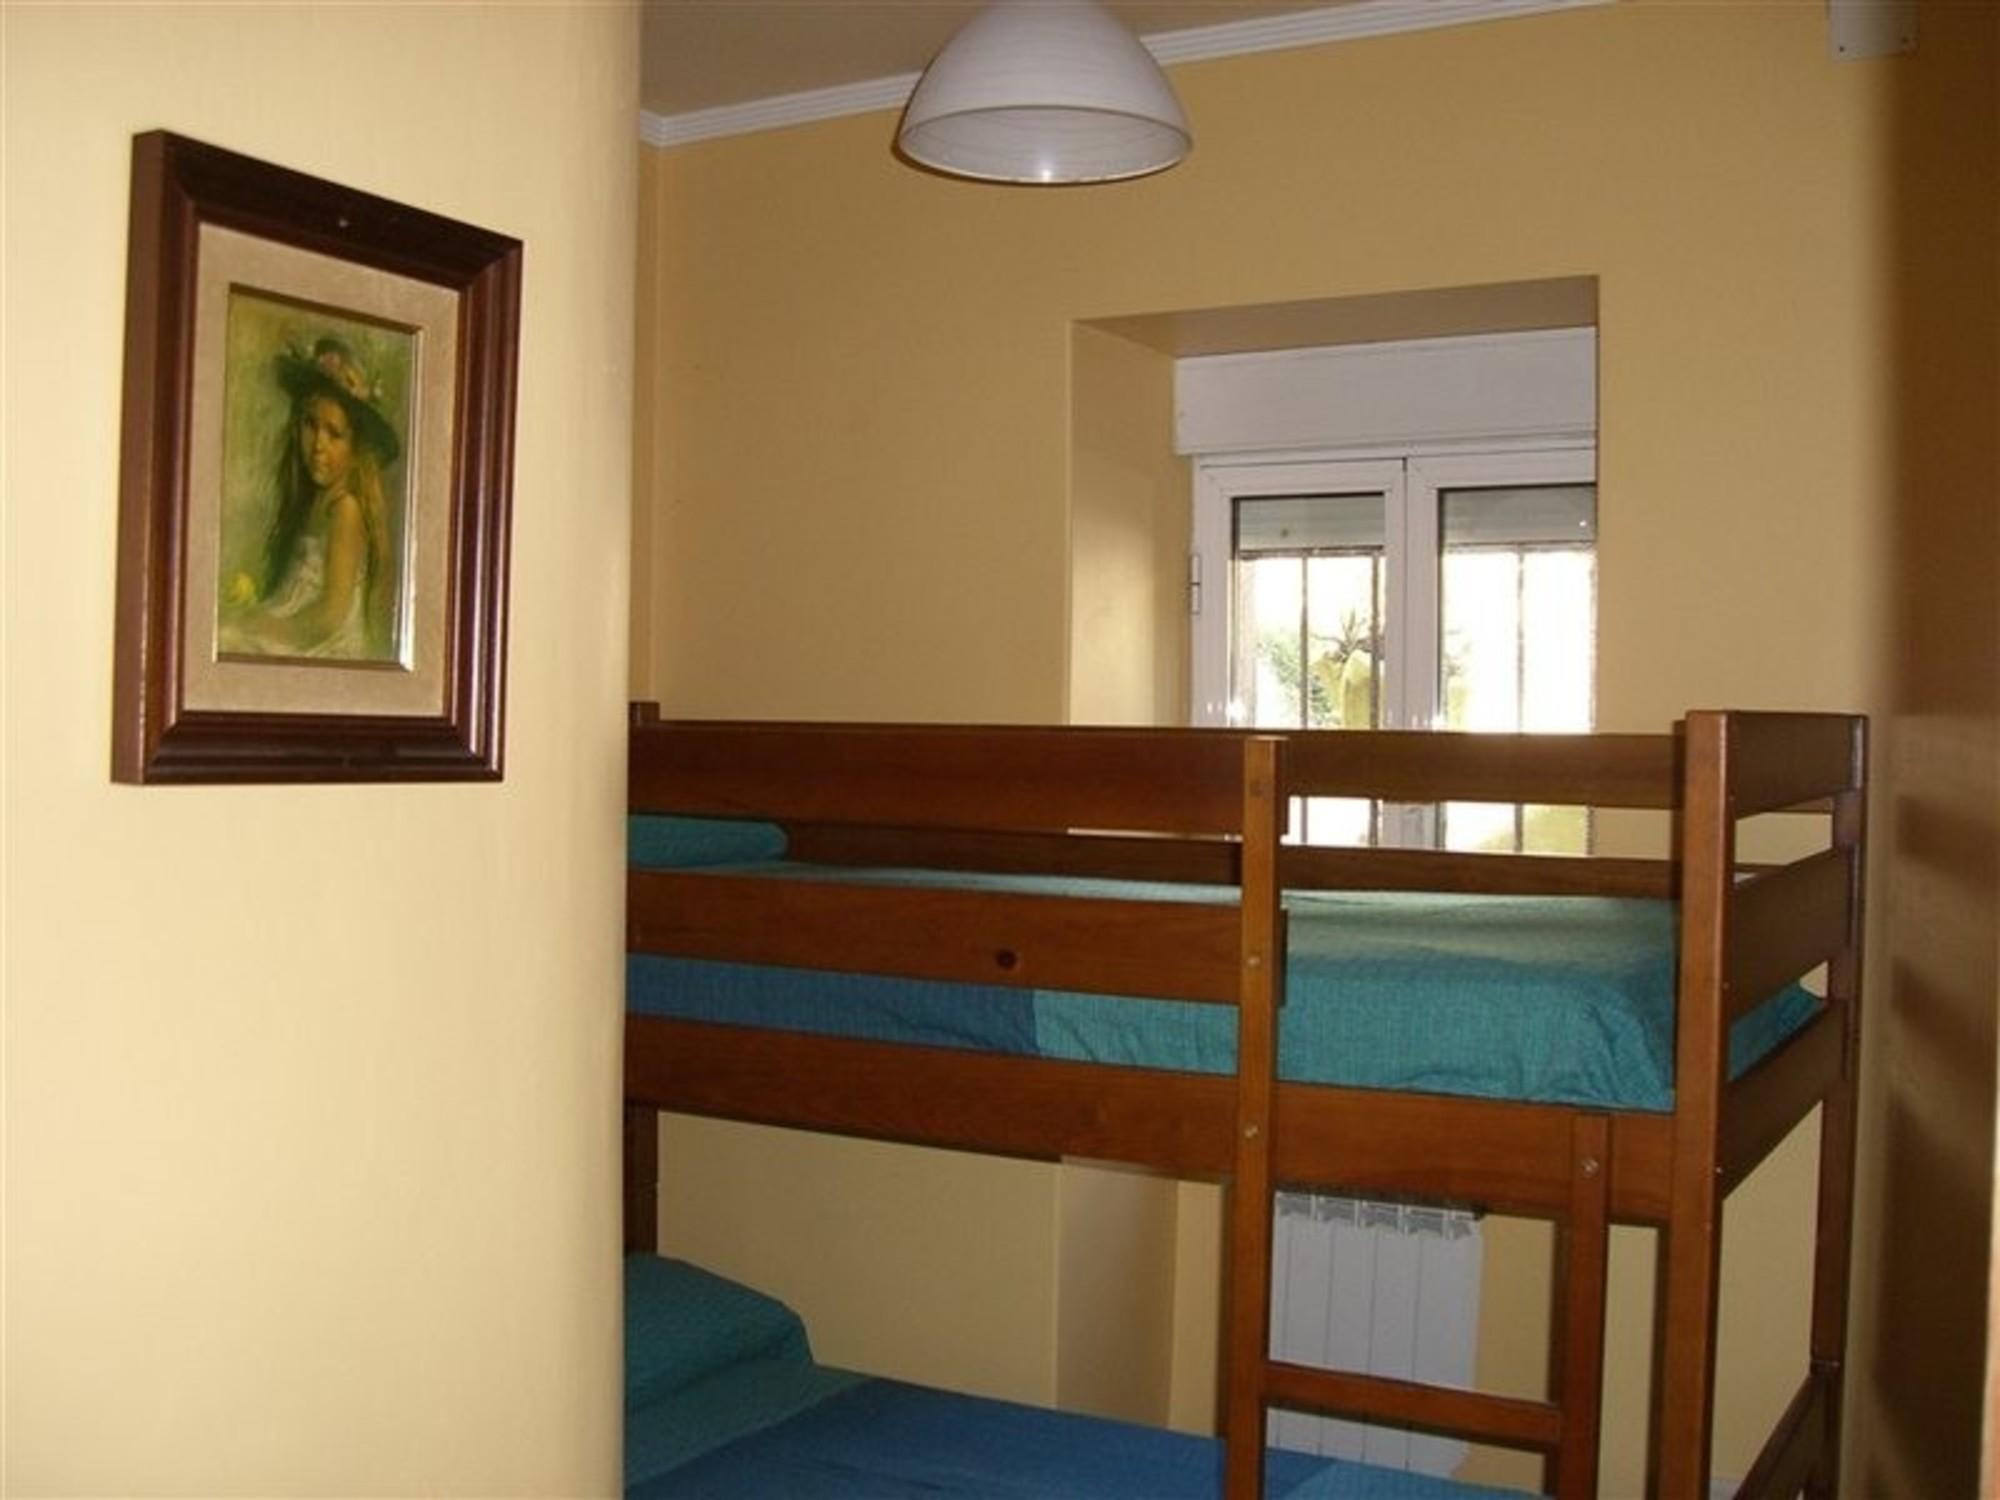 Ferienwohnung Apartment - 2 Bedrooms - 100119 (1937591), Vigo, Rias Bajas, Galicien, Spanien, Bild 7